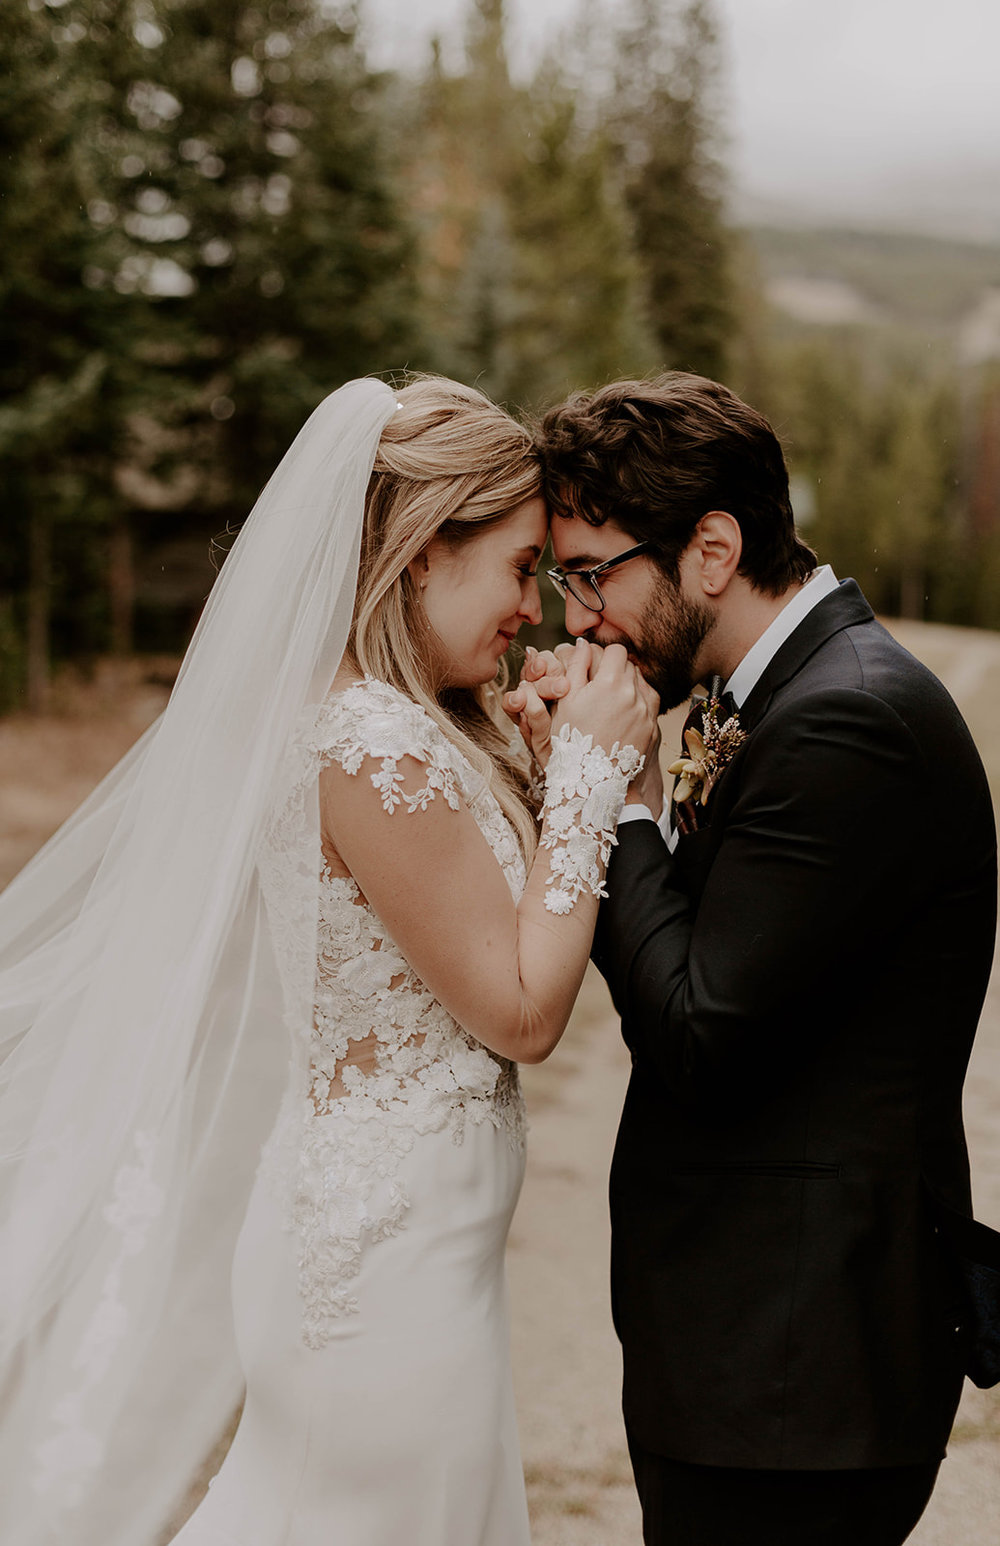 karra leigh photography- jenny and julio wedding814.jpg